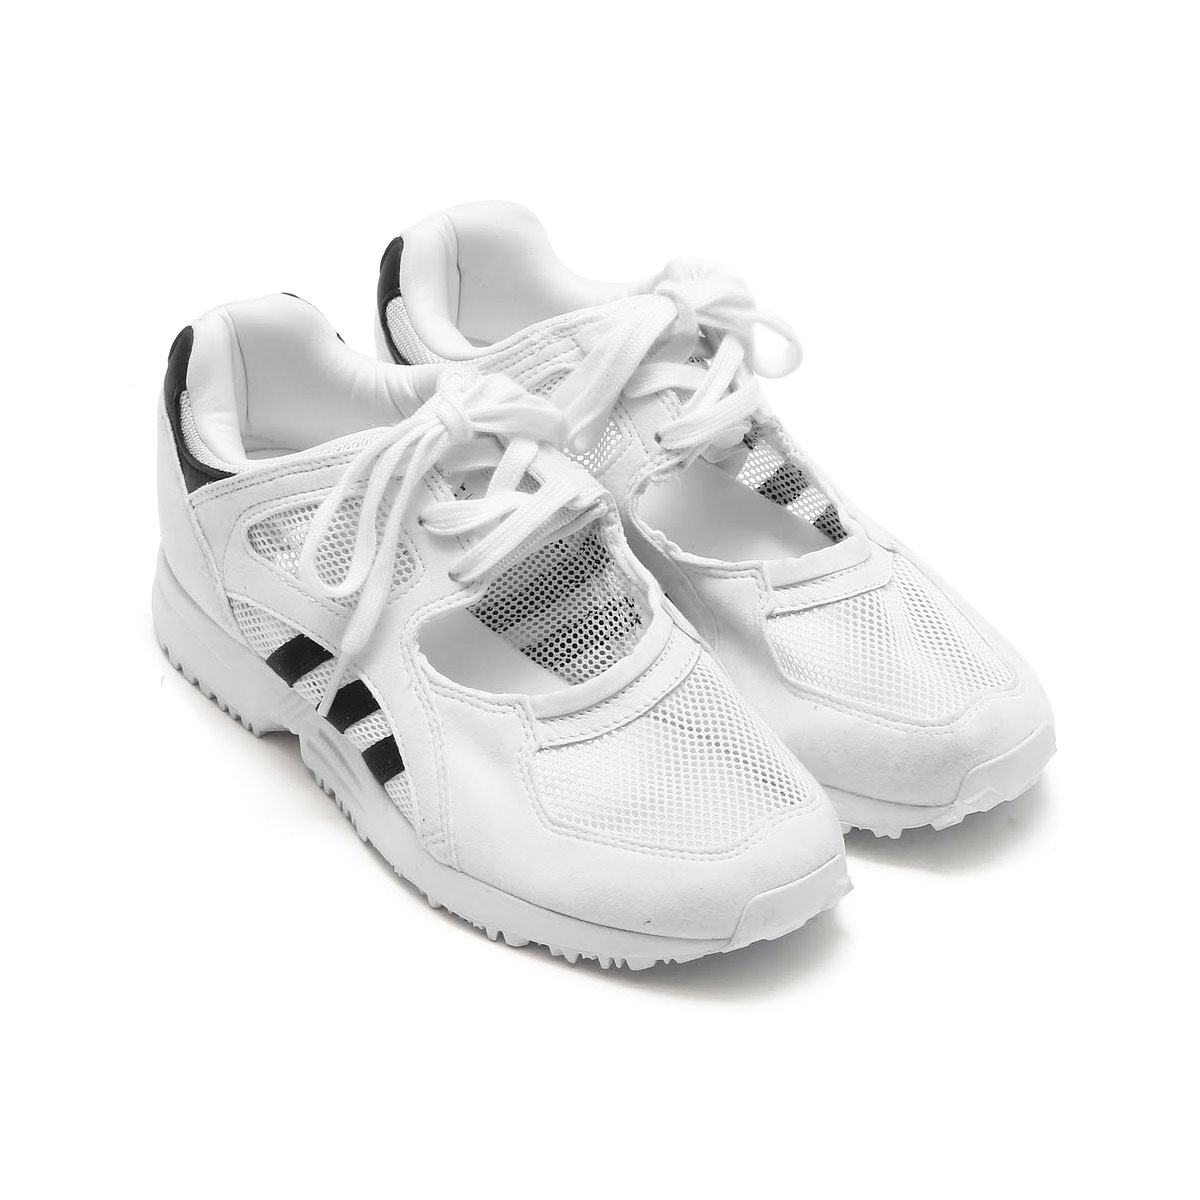 adidas Originals EQT RACING 91 W (アディダス EQT レーシング 91 W) RUNNING WHITE/RUNNING WHITE/CORE BLACK【レディース スニーカー】17SS-I